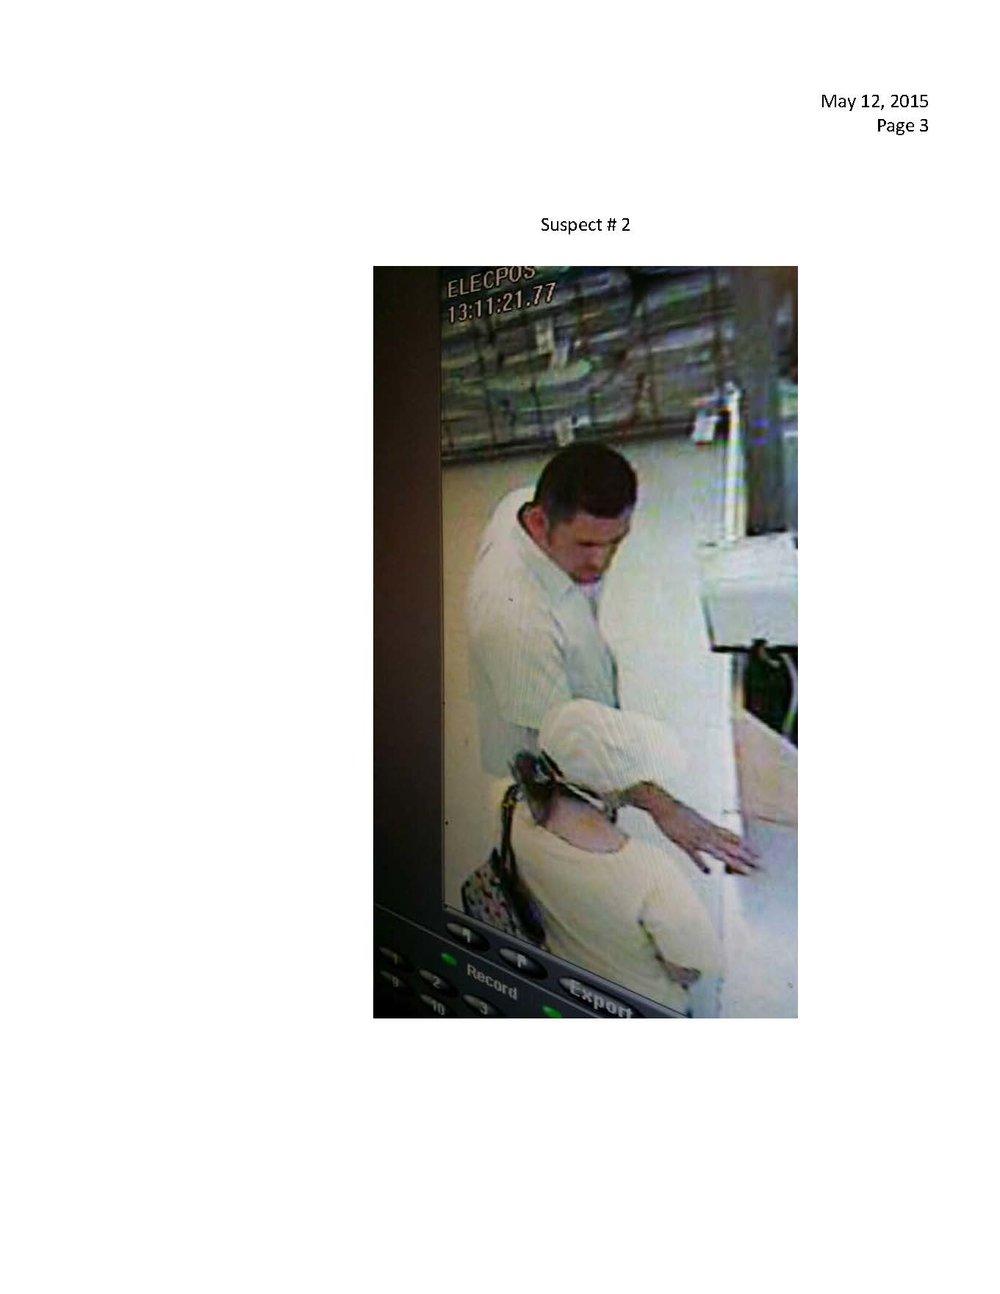 051215 Linda Vista Area Residential Burglary_Page_3